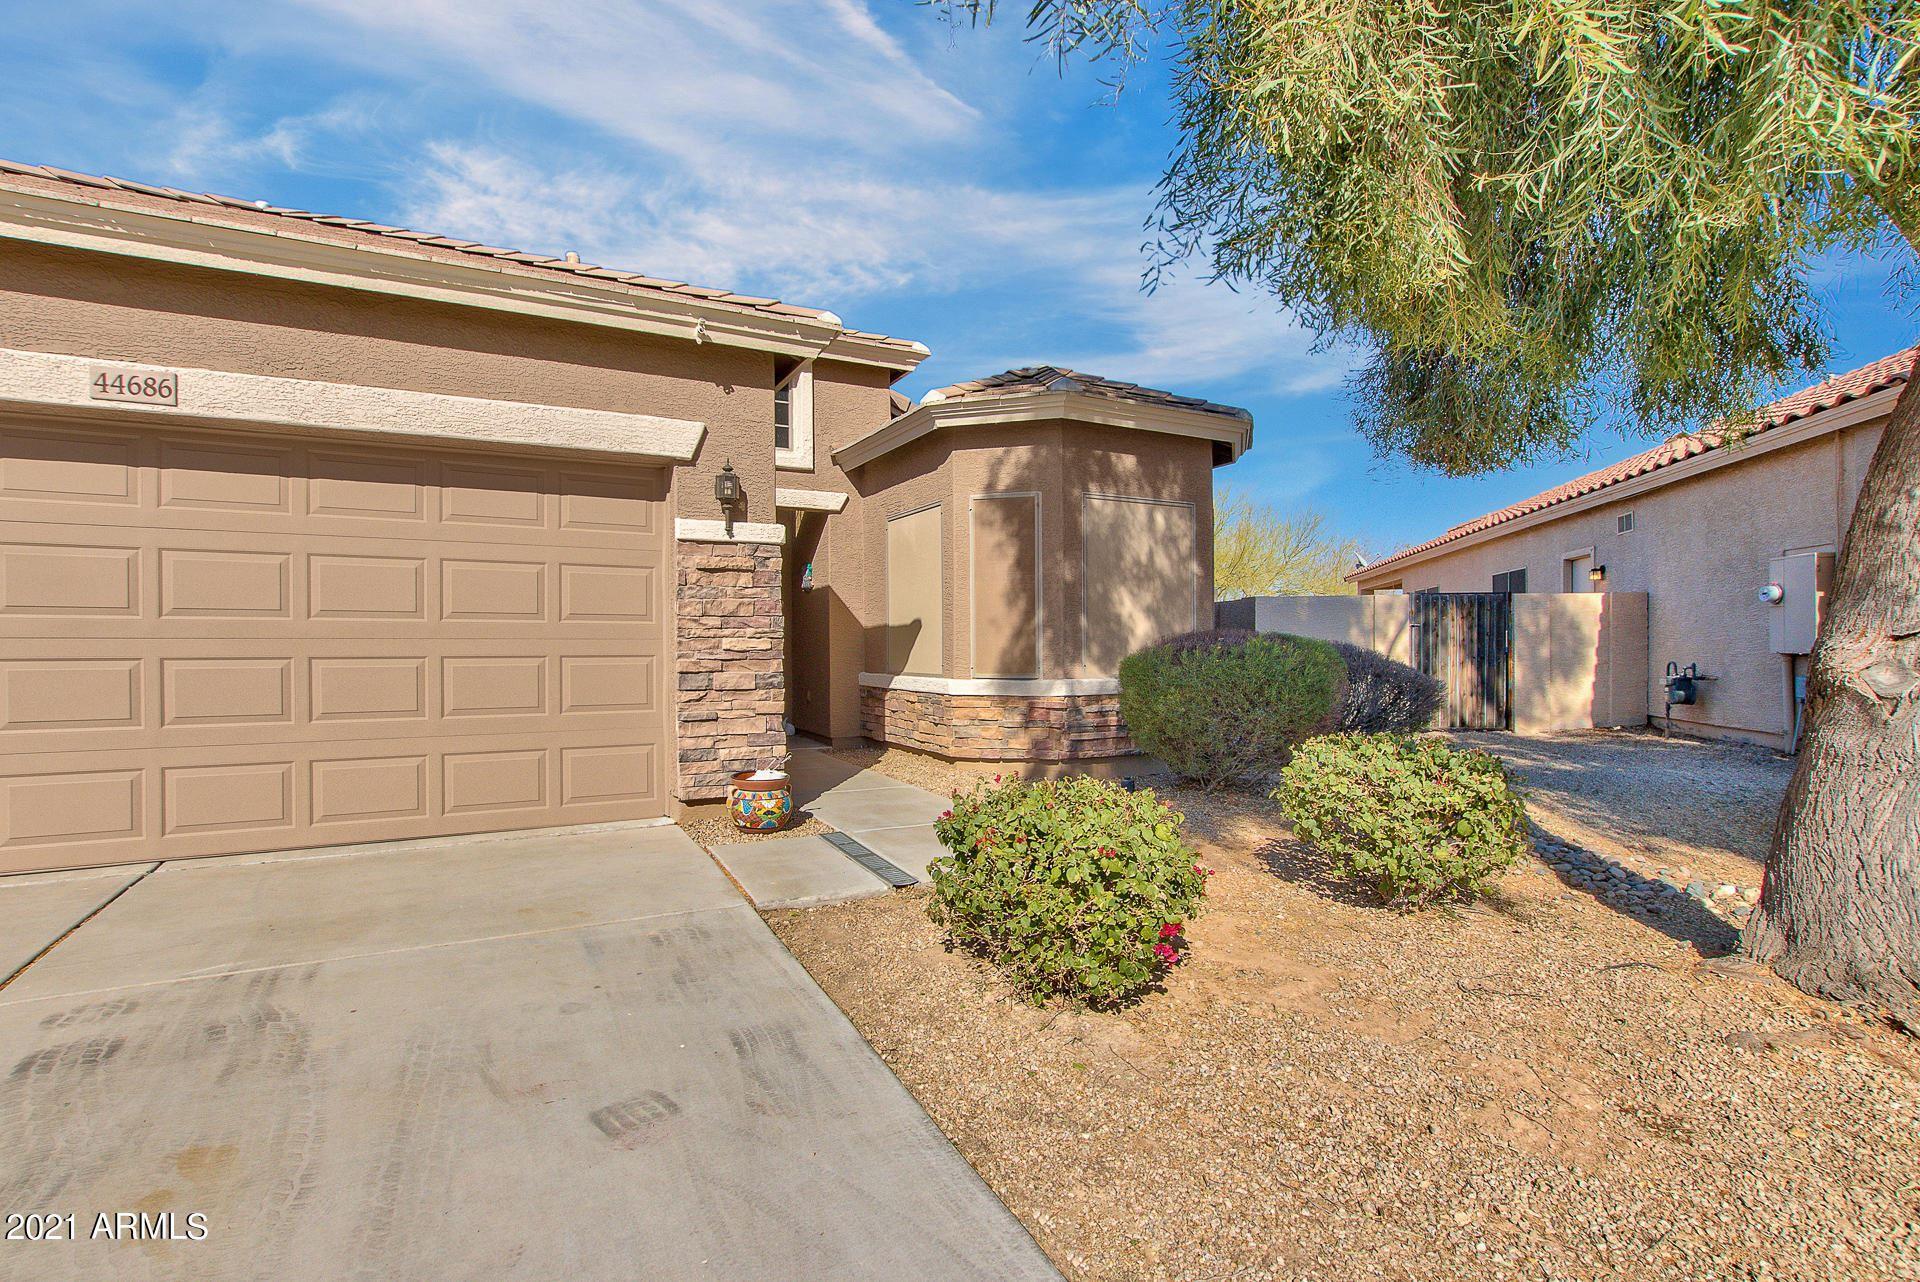 Photo of 44686 W PARAISO Lane, Maricopa, AZ 85139 (MLS # 6200836)